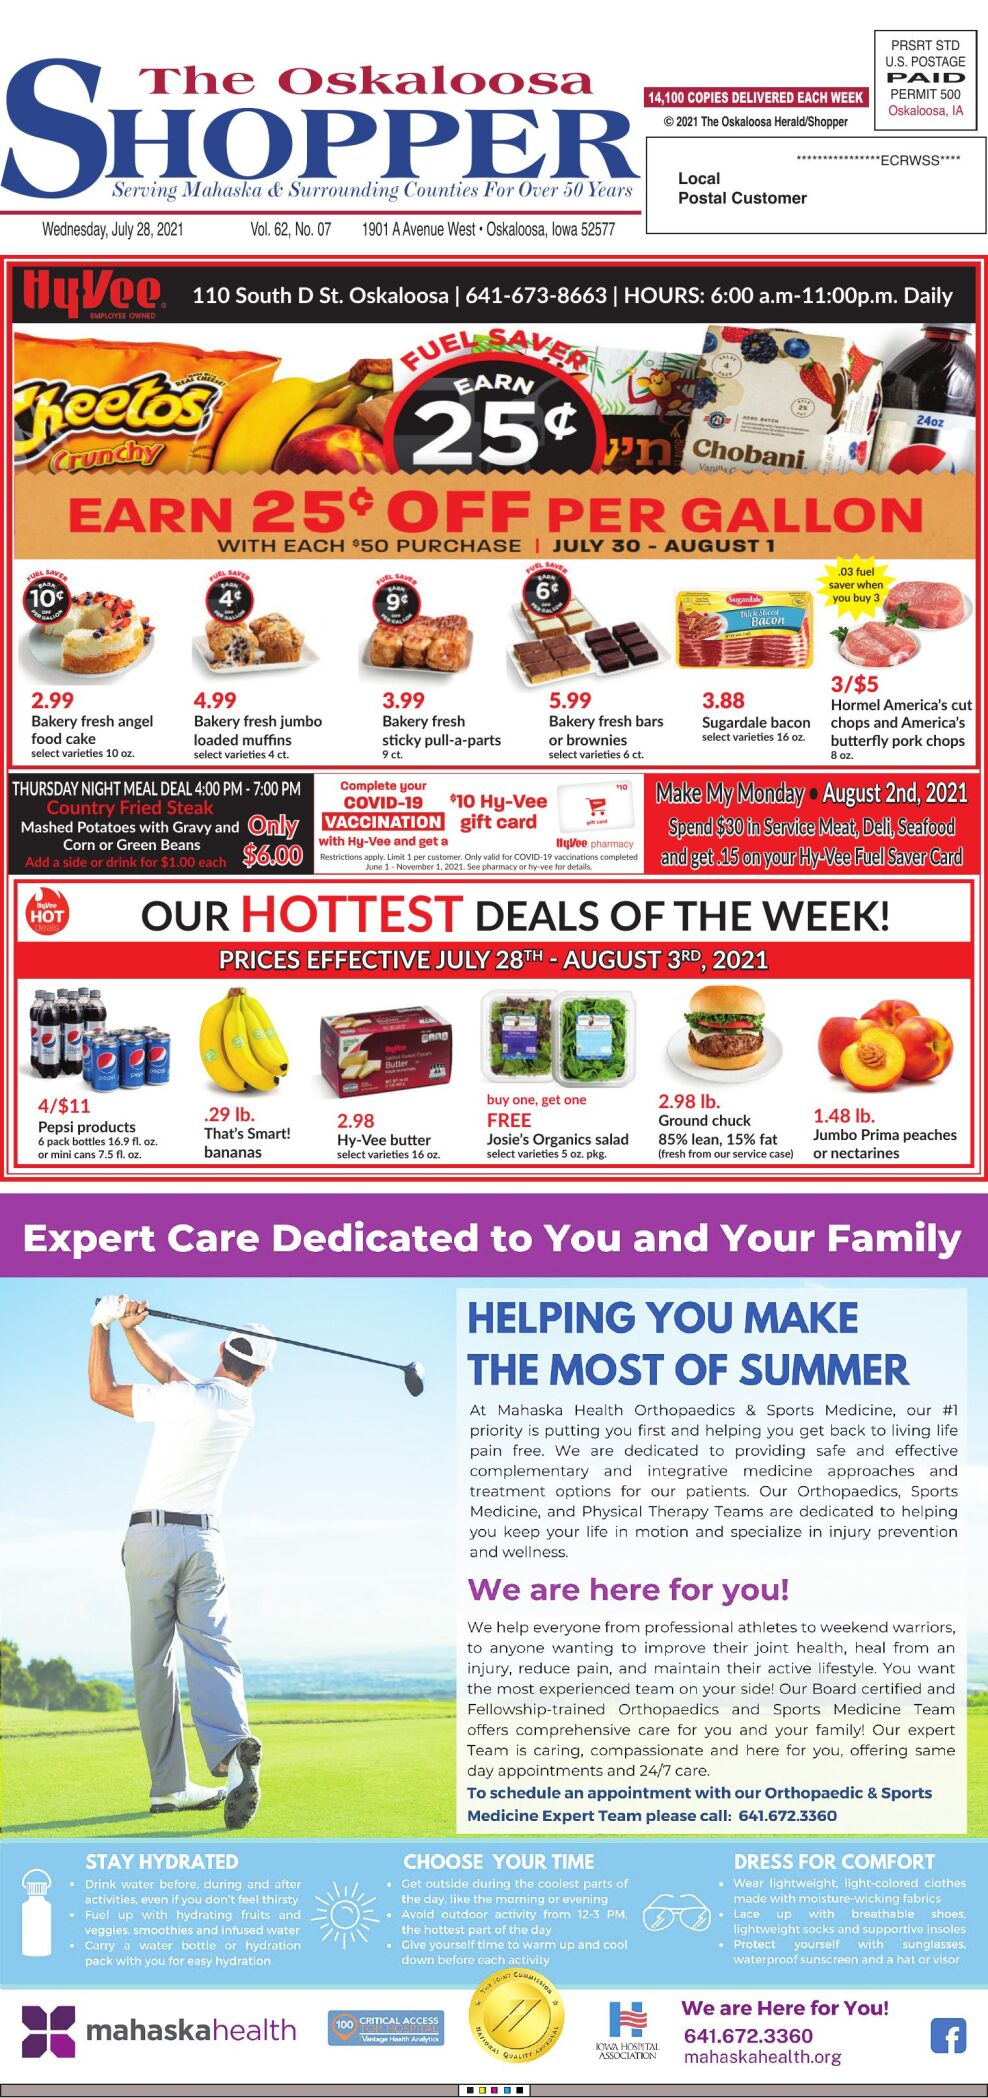 The Oskaloosa Shopper week of 07/28/21